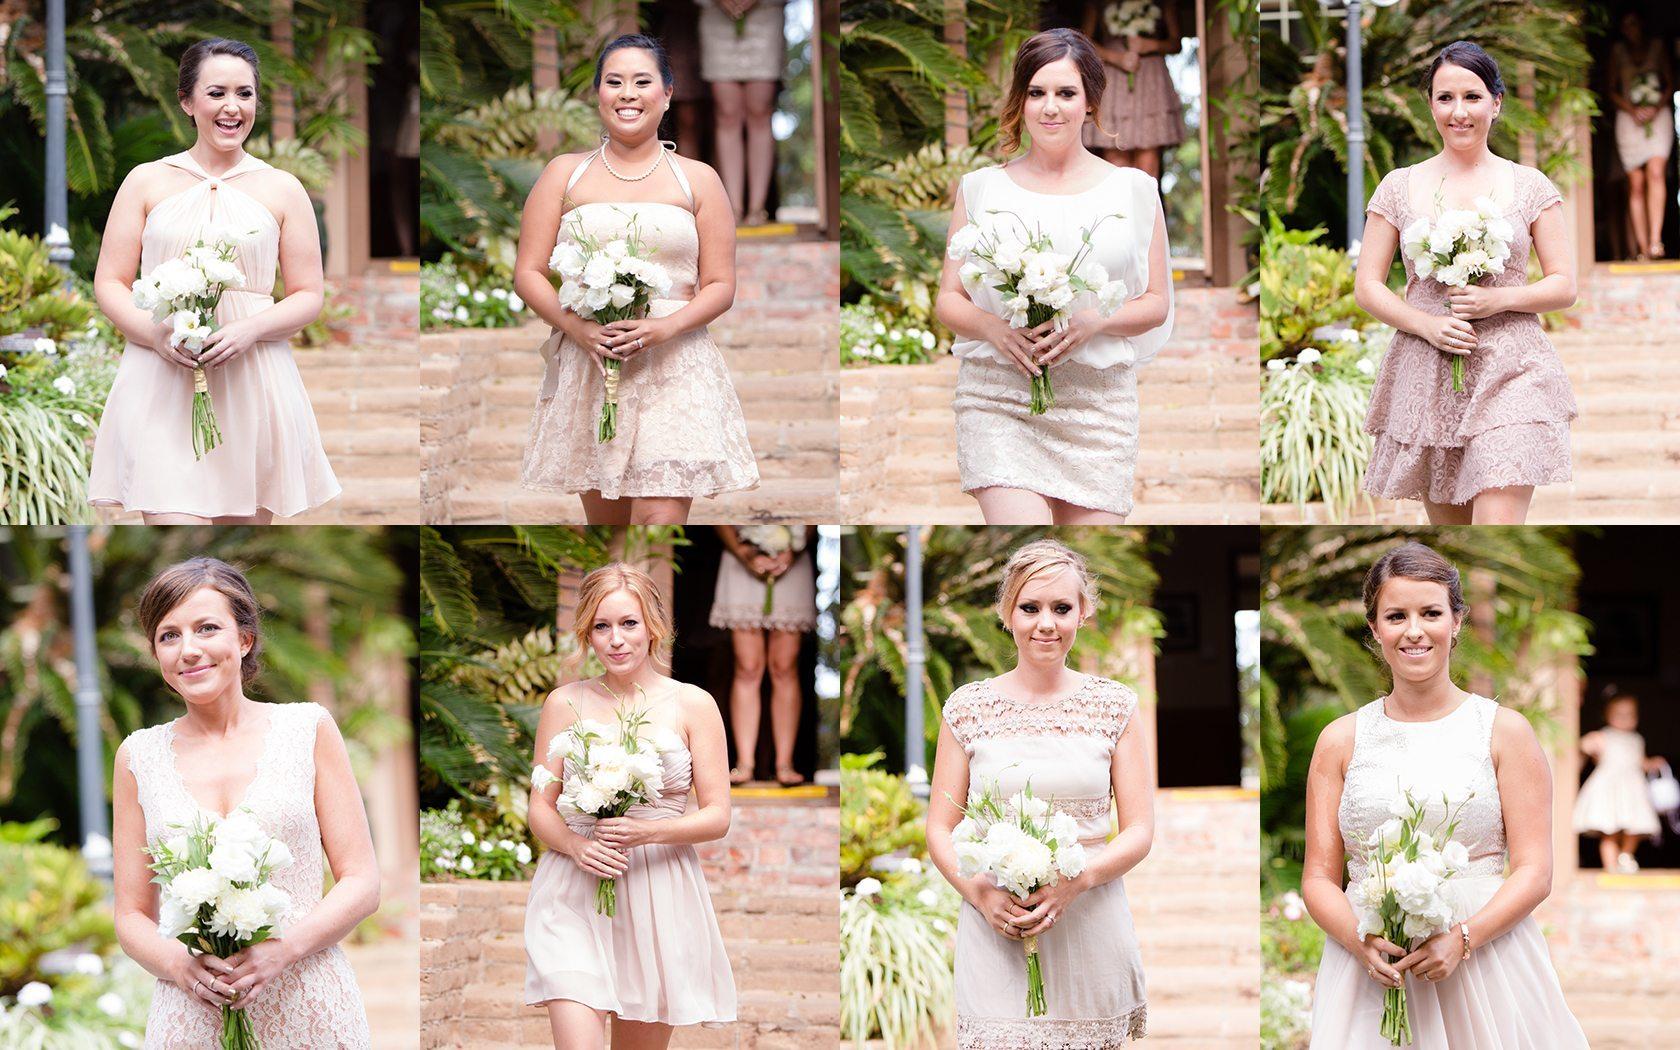 San_Diego_Botanic_Gardens_Wedding_023.jpg